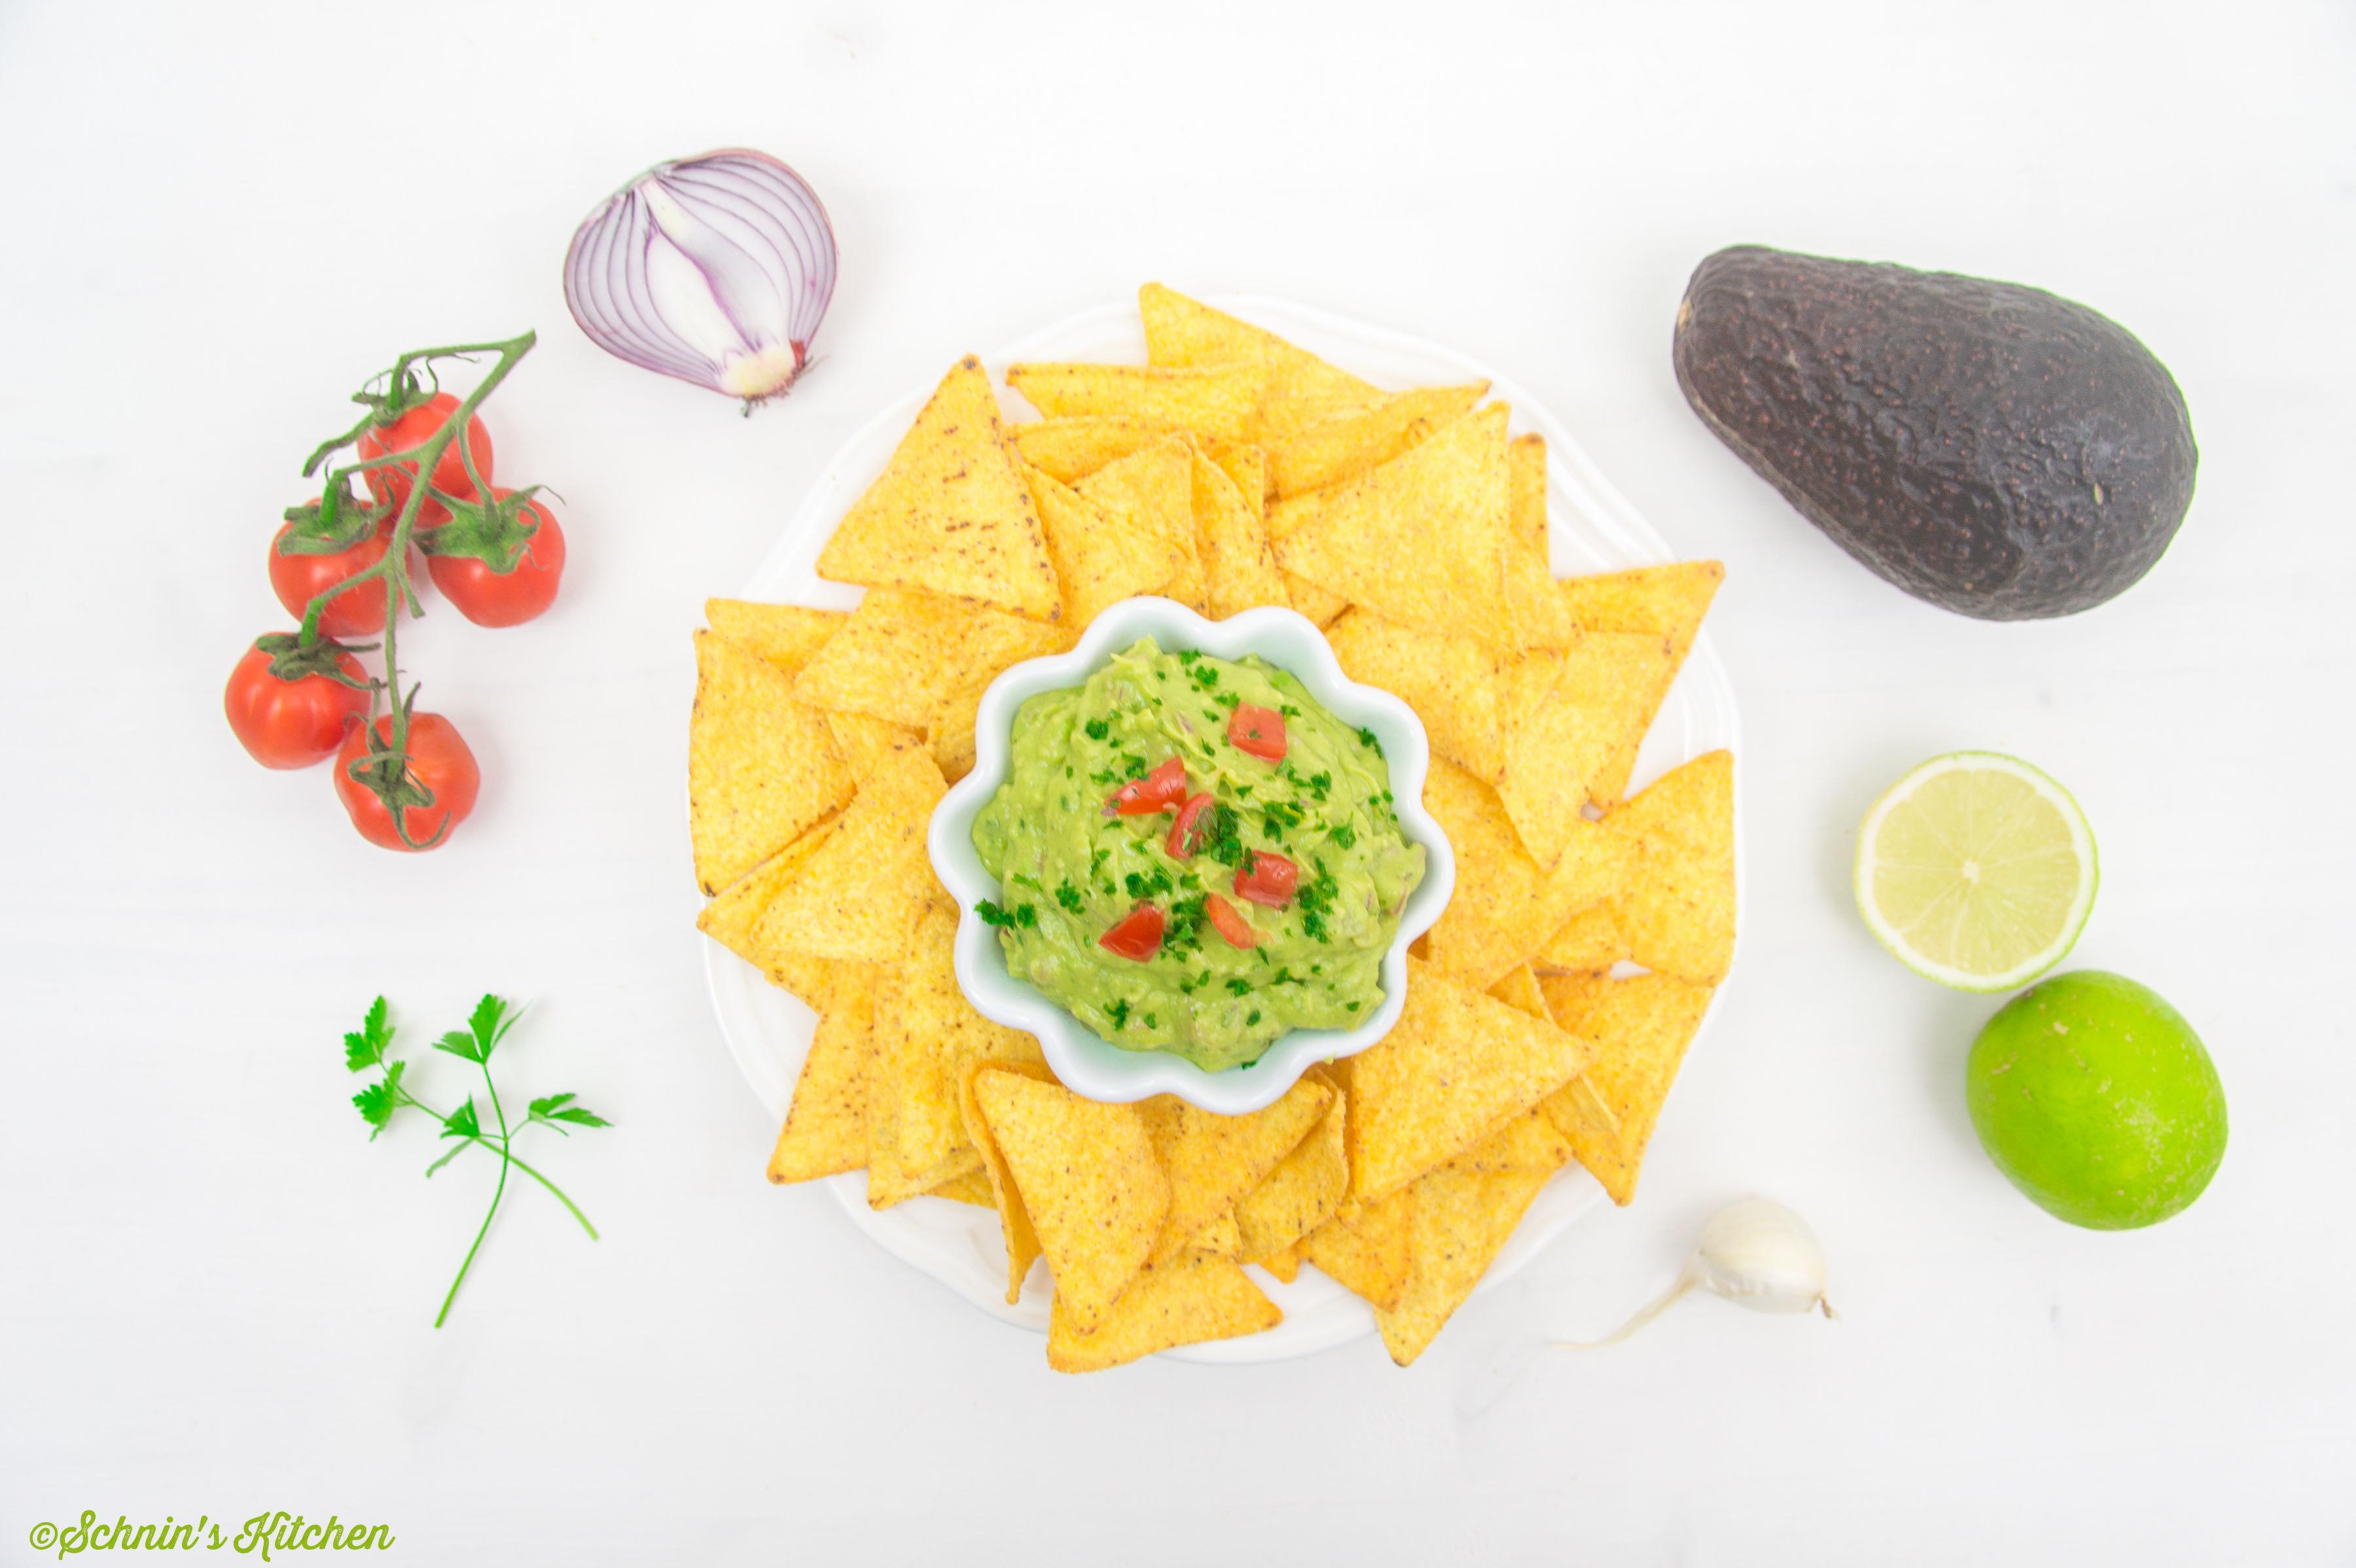 Schnin's Kitchen: Guacamole - mexikanischer Avocado-Dip